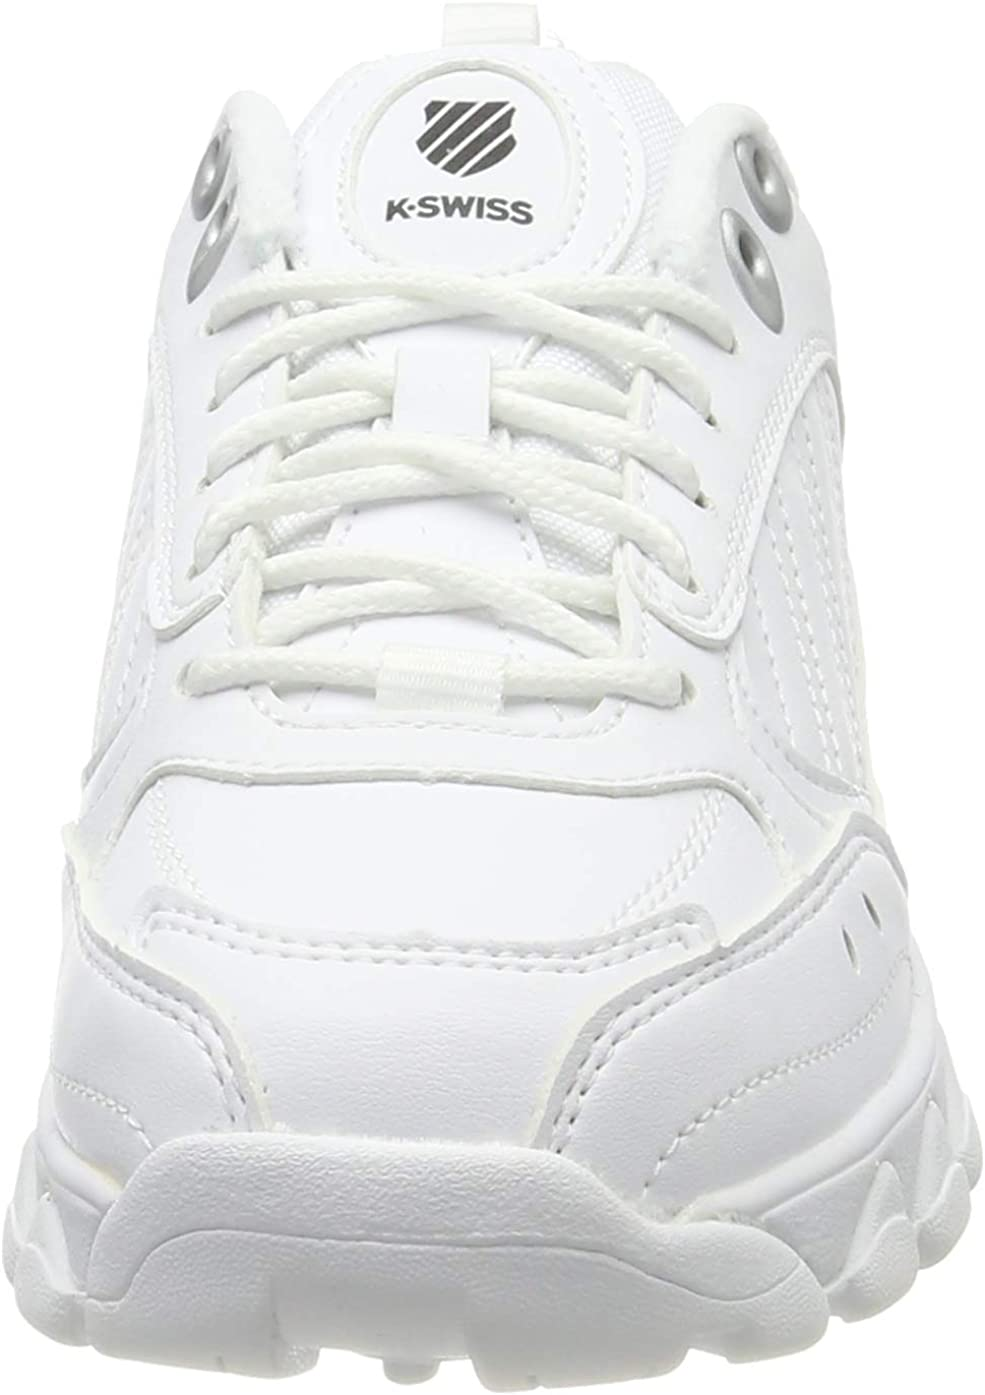 K Swiss Womens Hs329 Low Top Sneakers